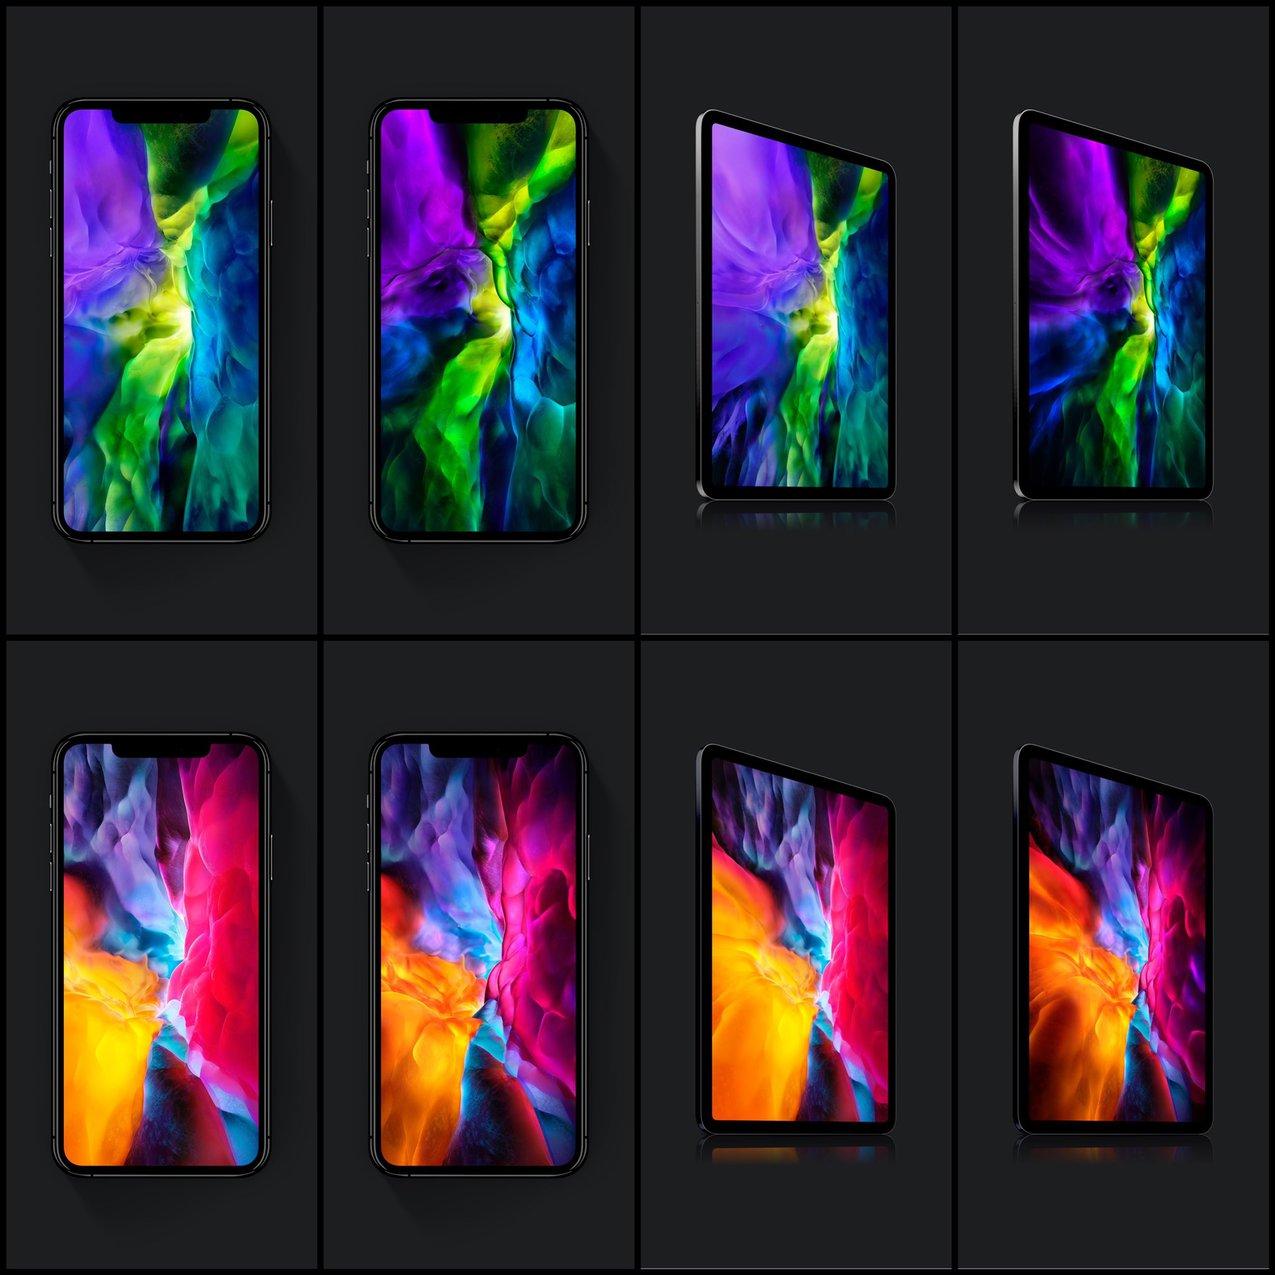 iPad Pro Wallpapers